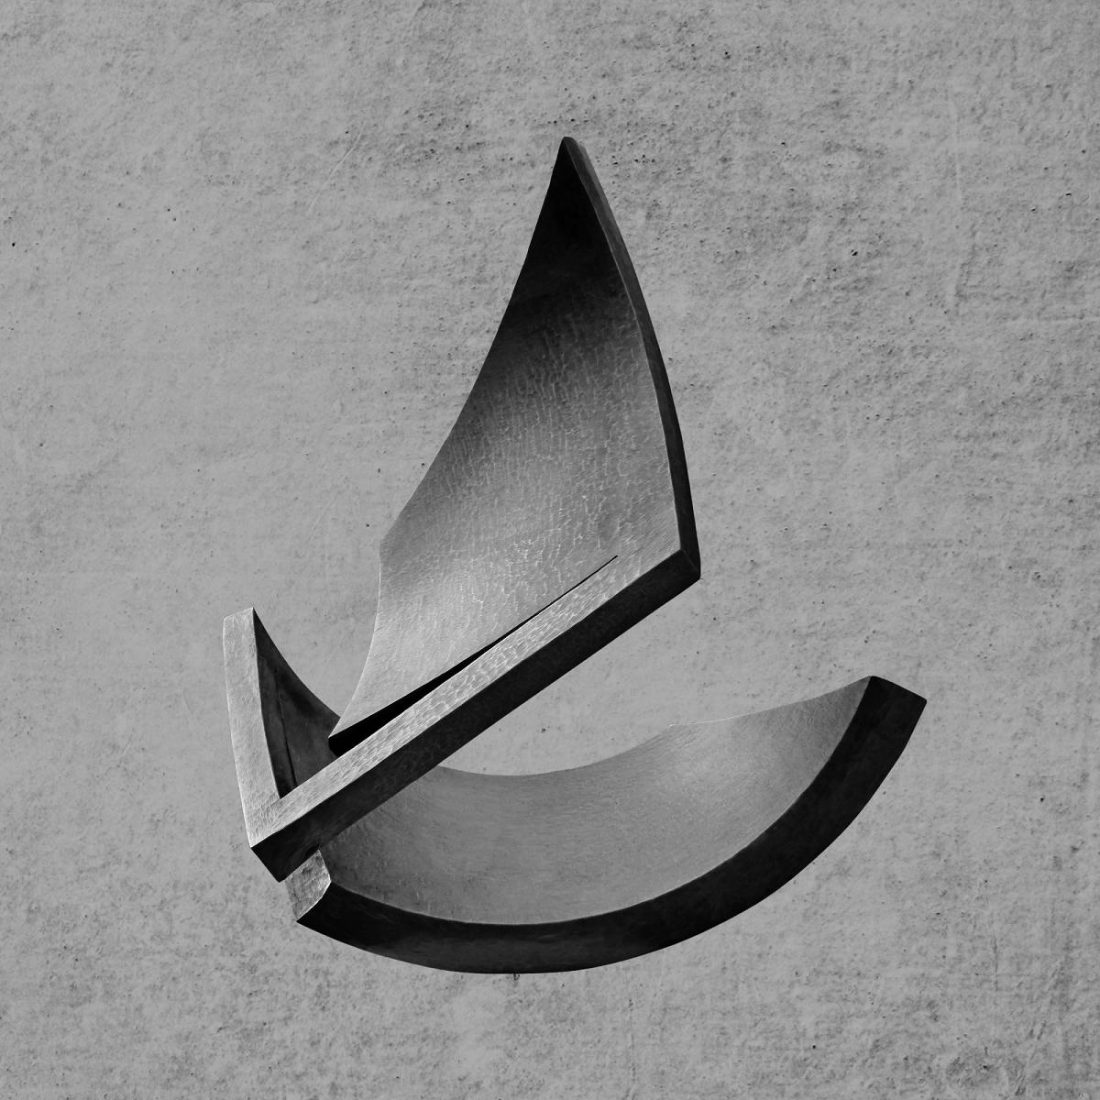 Arovana/Hatami * Hatami/Martin/Attanasio – Ambientblog